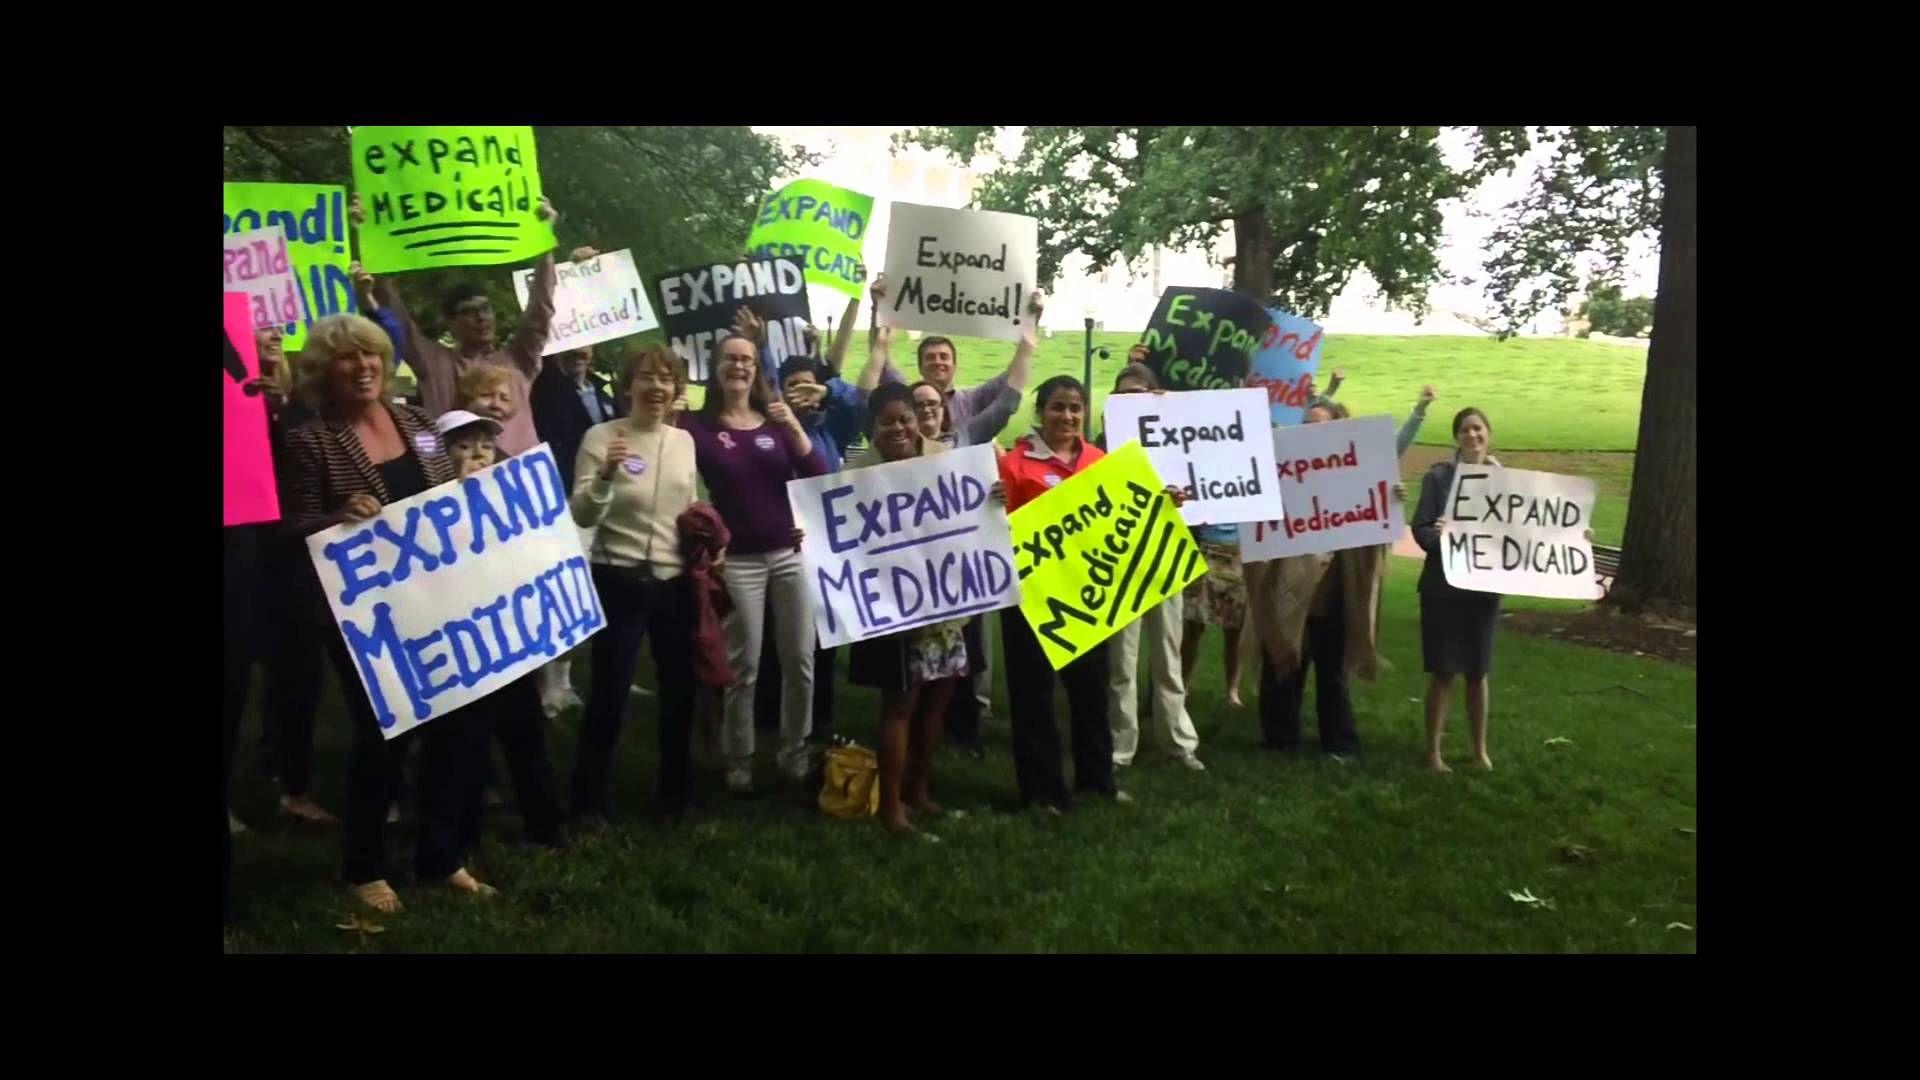 Expand Medicaid! Medicaid, Expand, Blue waves